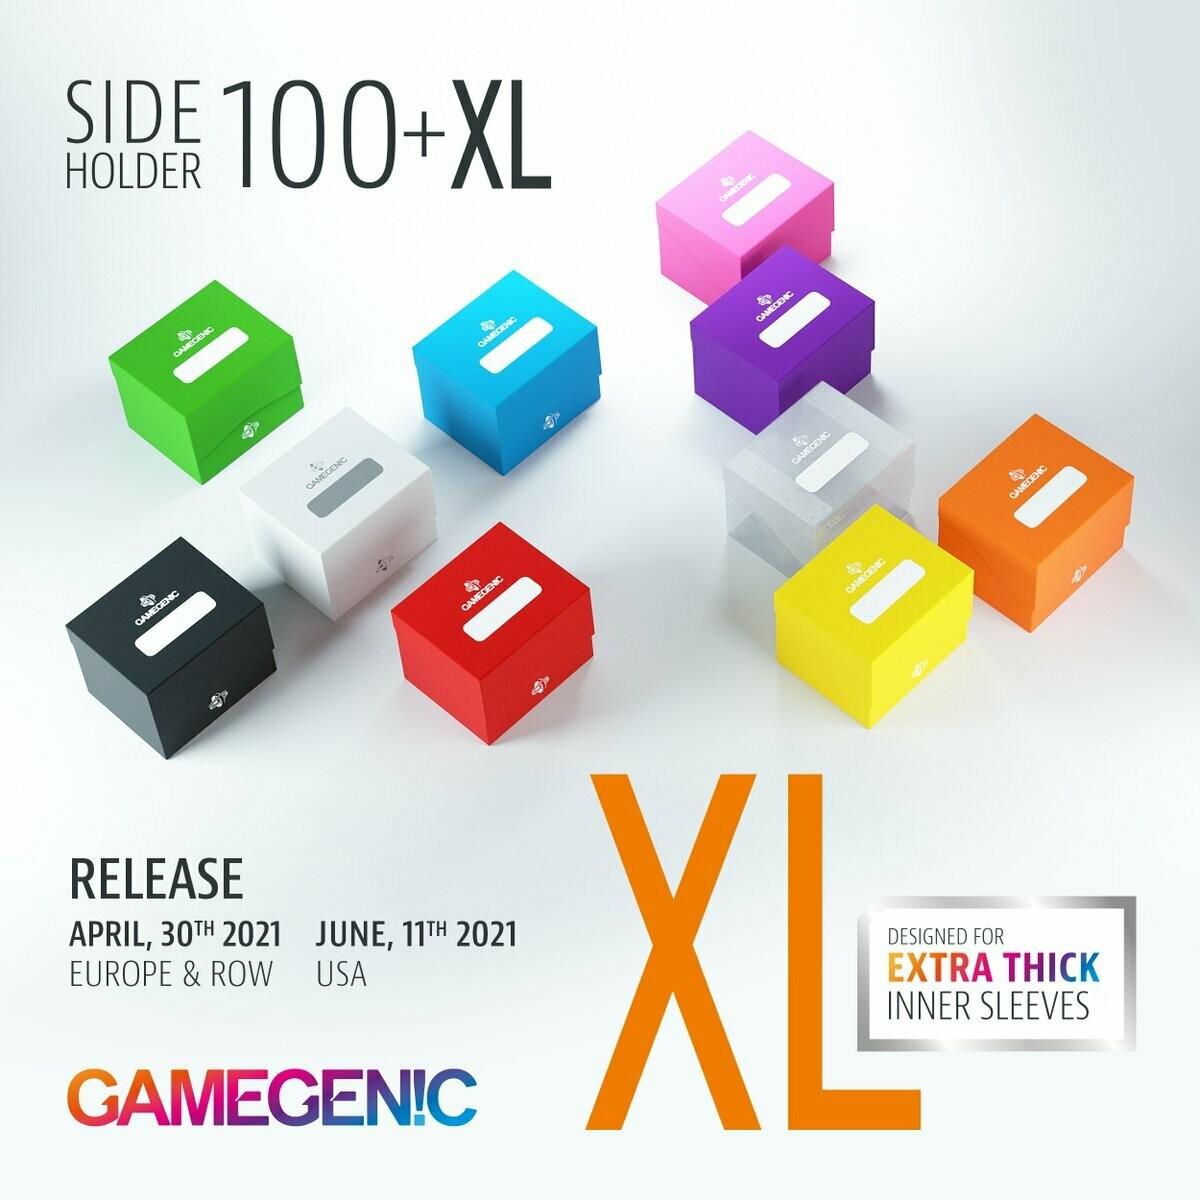 Side Holder 100+ XL Colori Vari